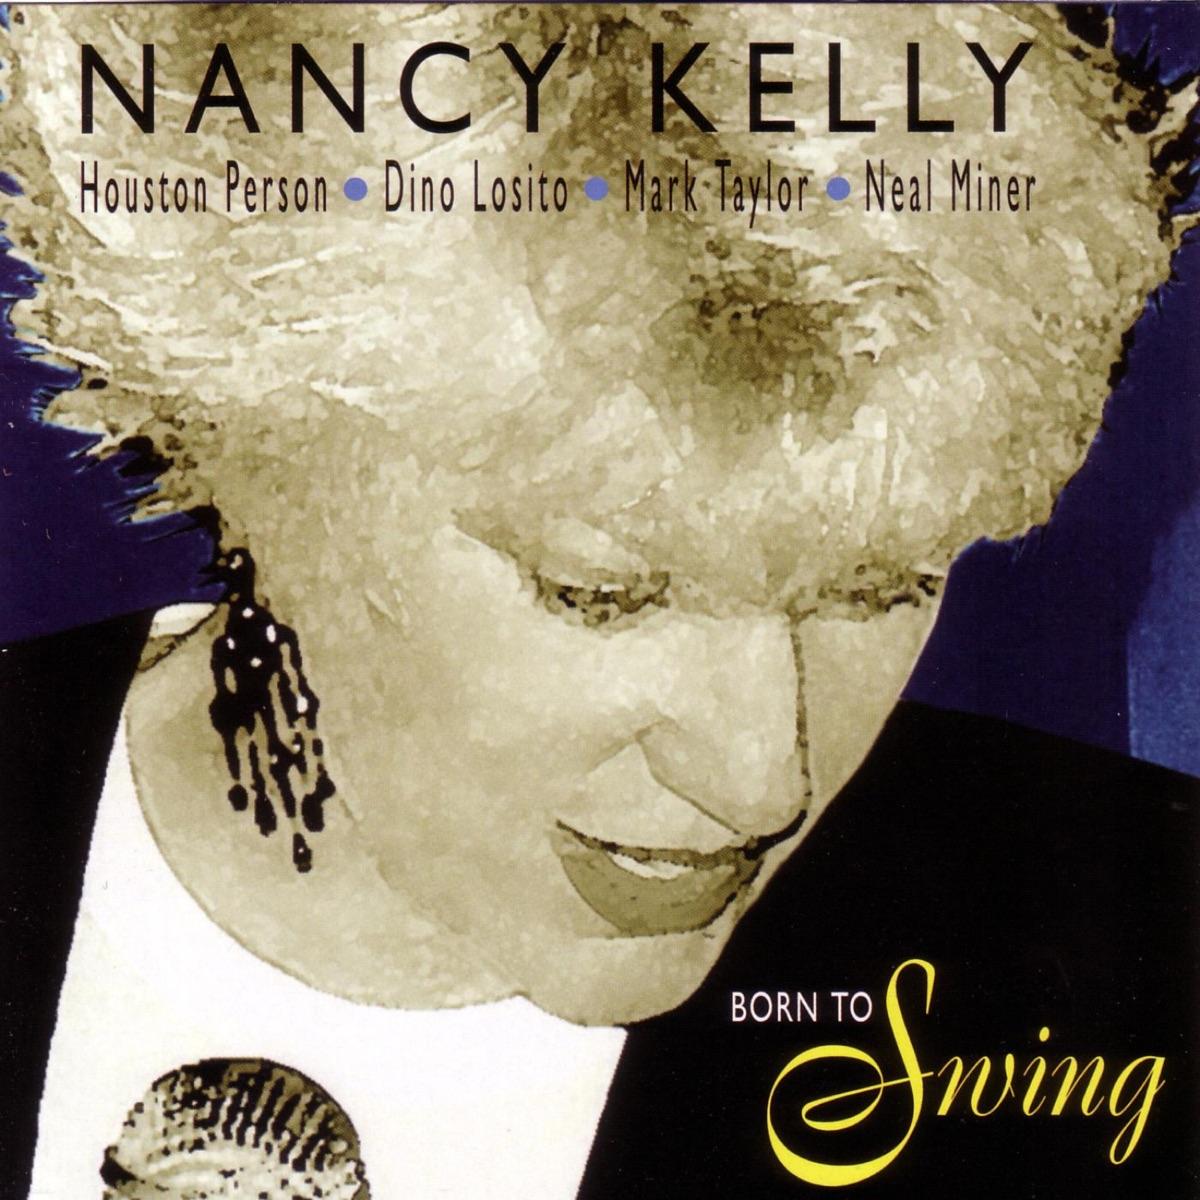 Nancy Kelly